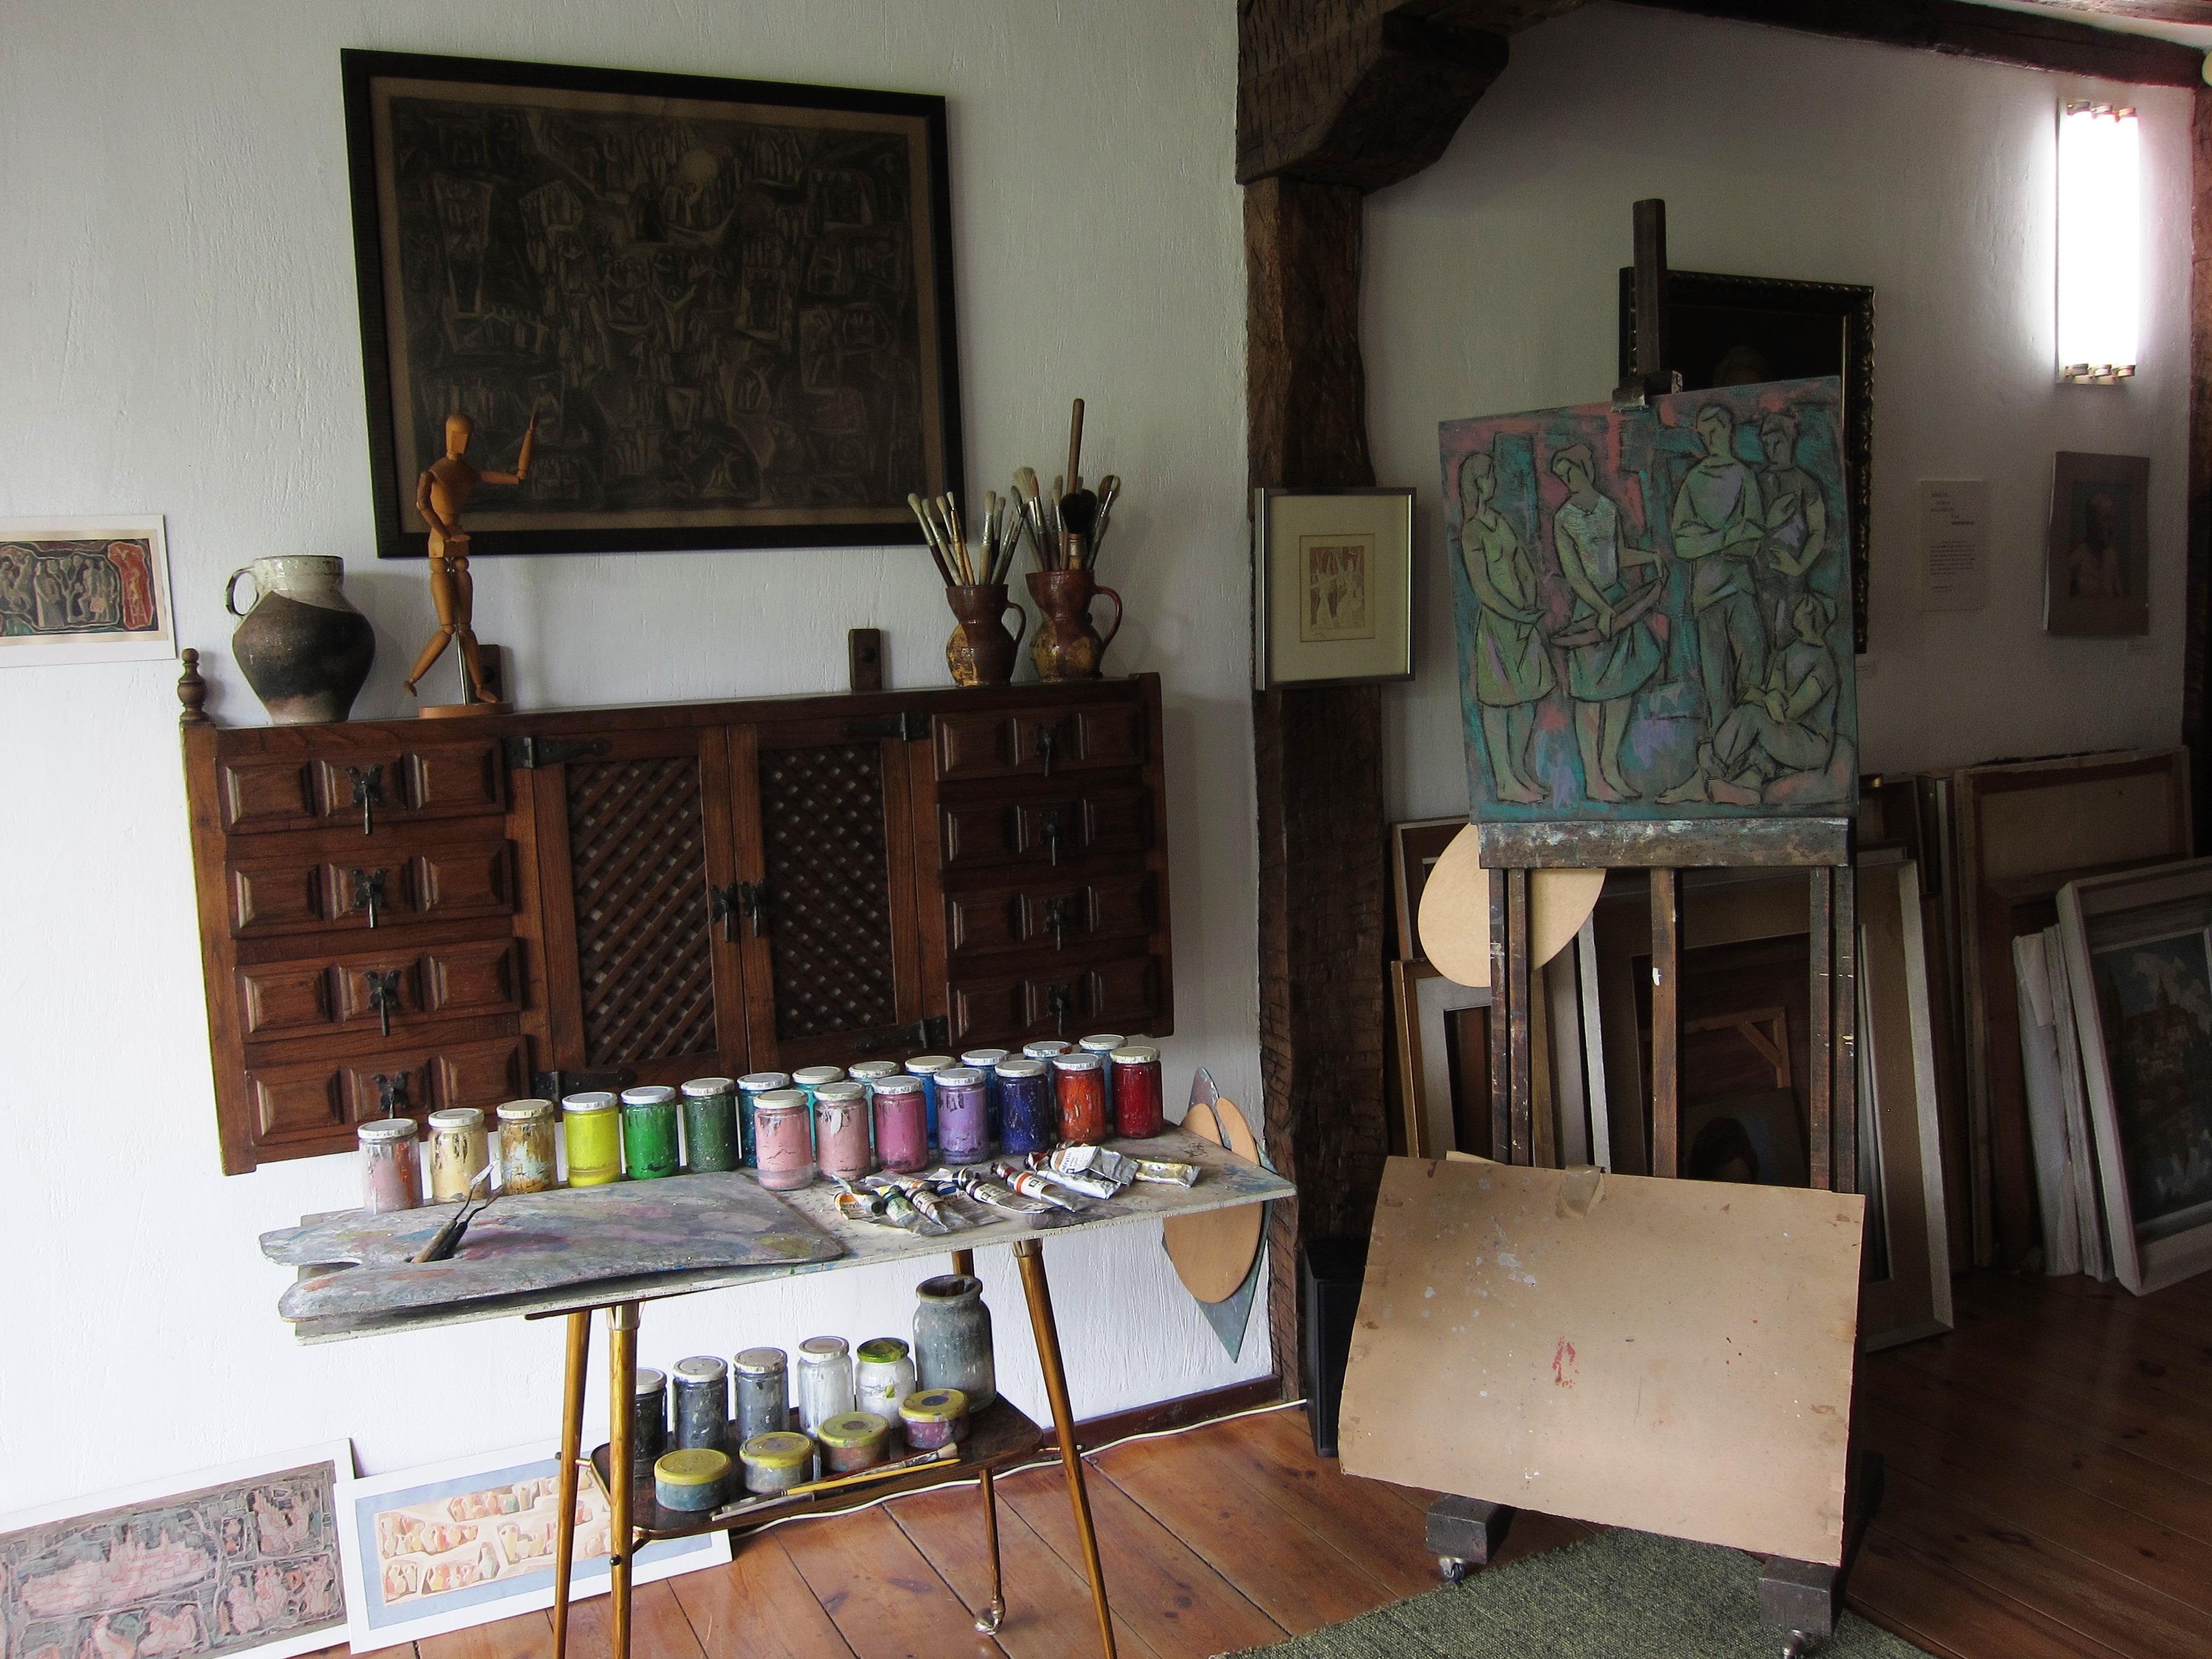 Visita guiada al Estudio del pintor Rodet Villa